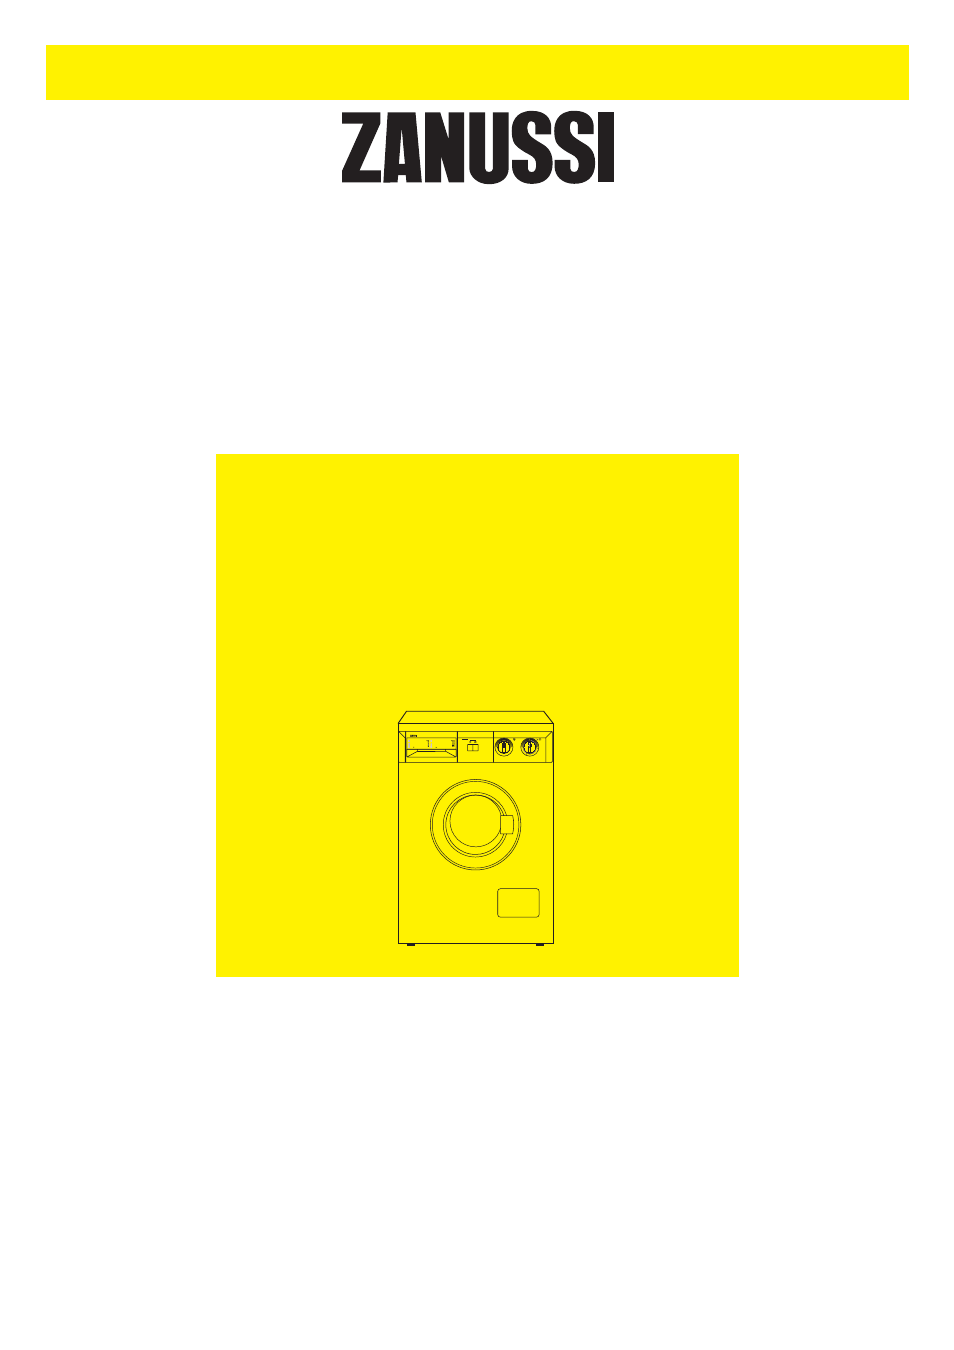 Zanussi Fls 802 инструкция - картинка 3